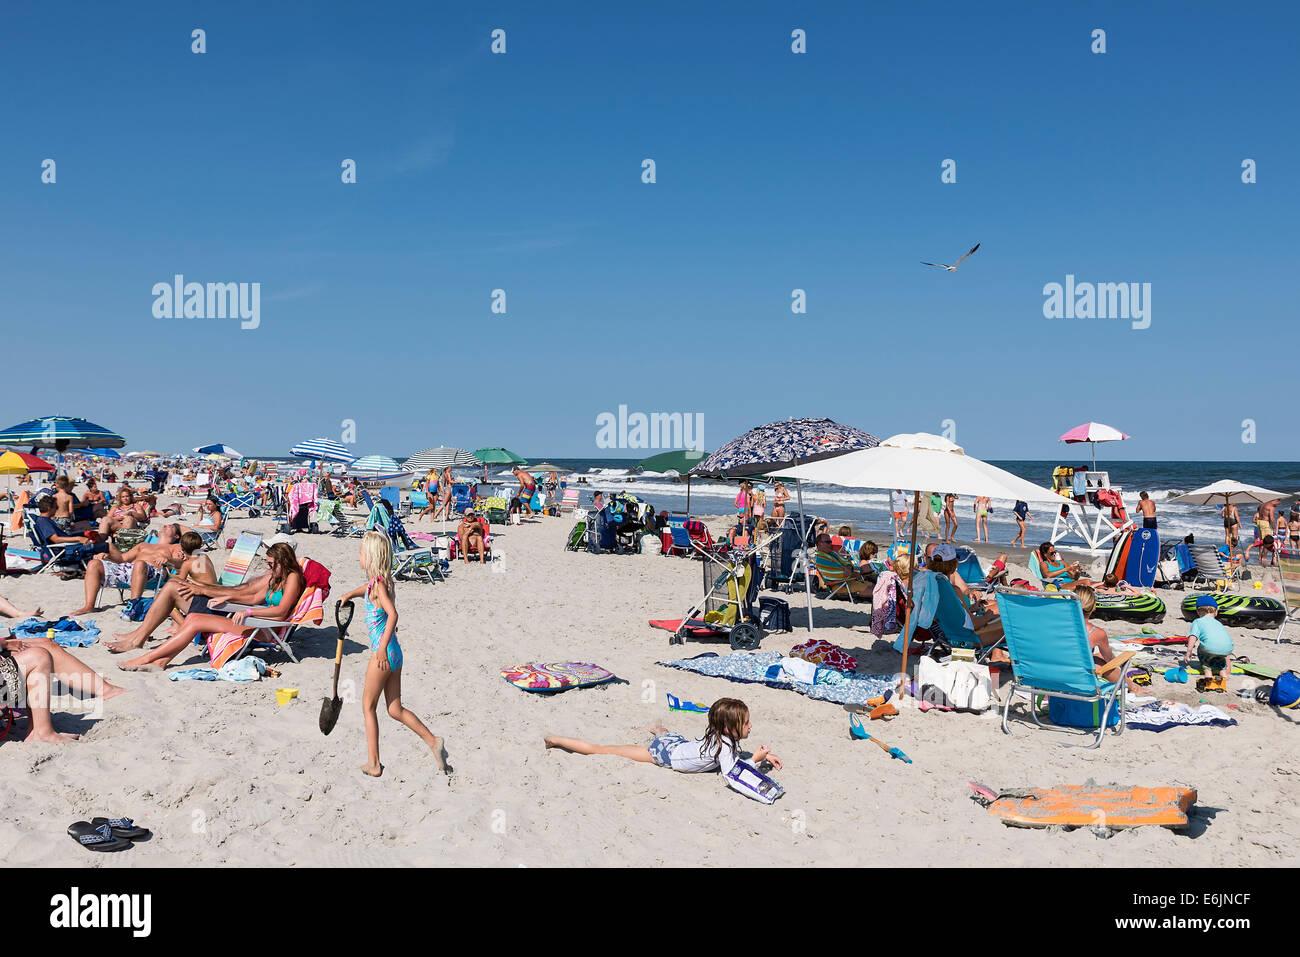 Busy beach, Stone Harbor, New Jersey, USA - Stock Image